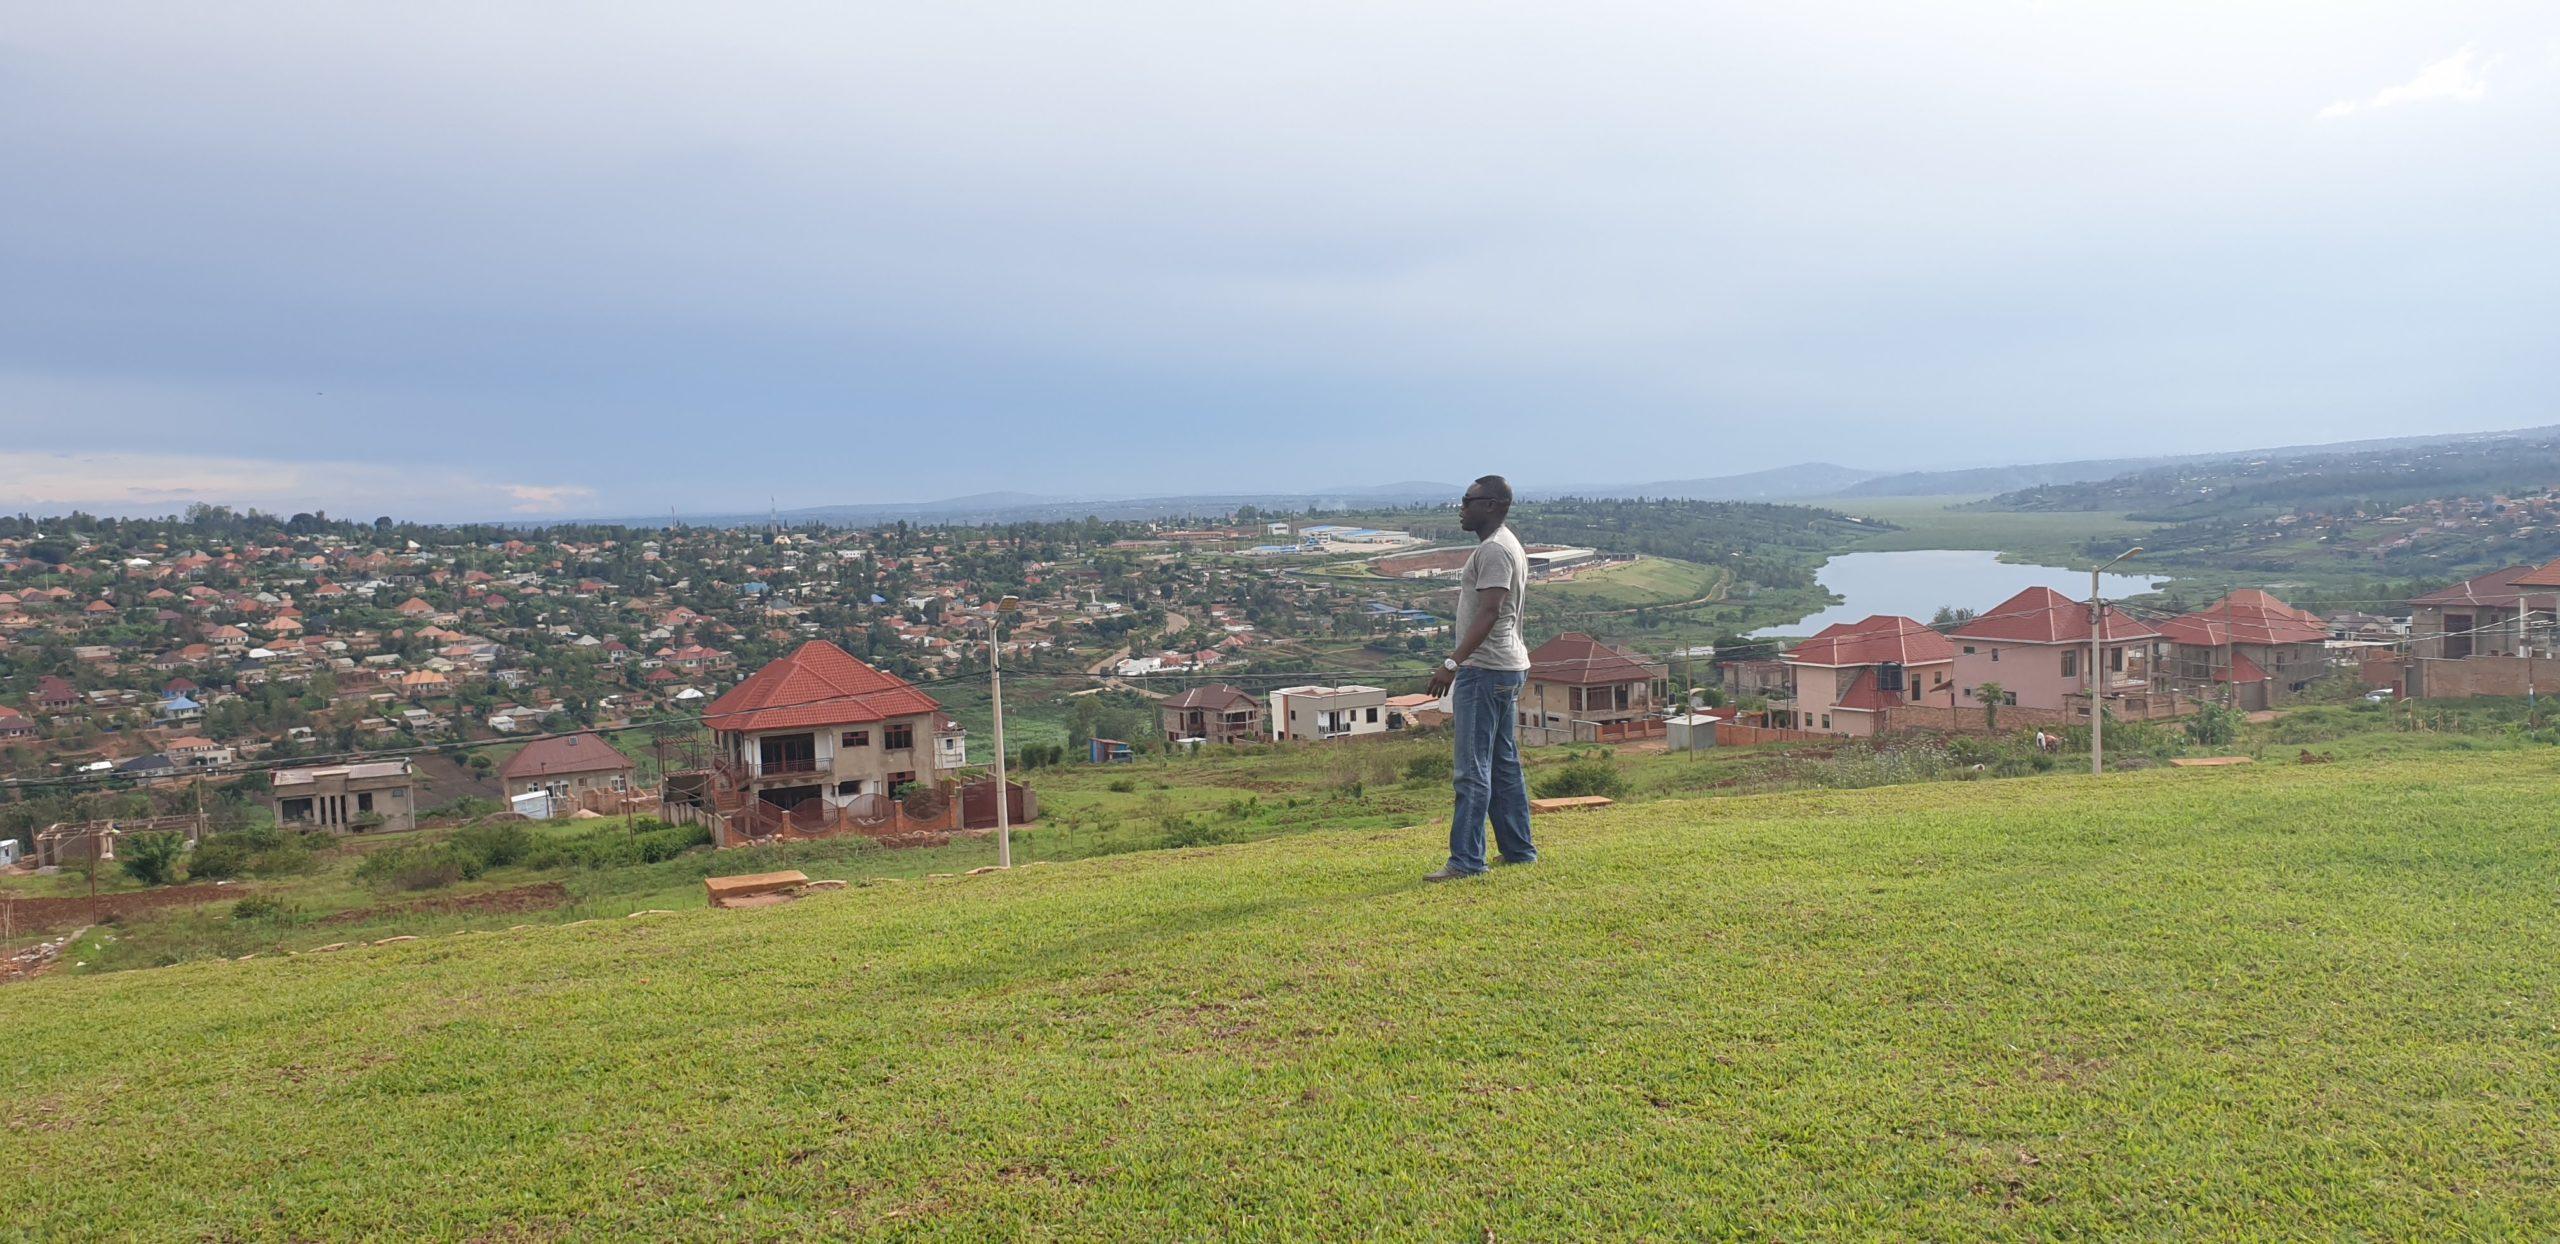 BomaLink, Rwanda